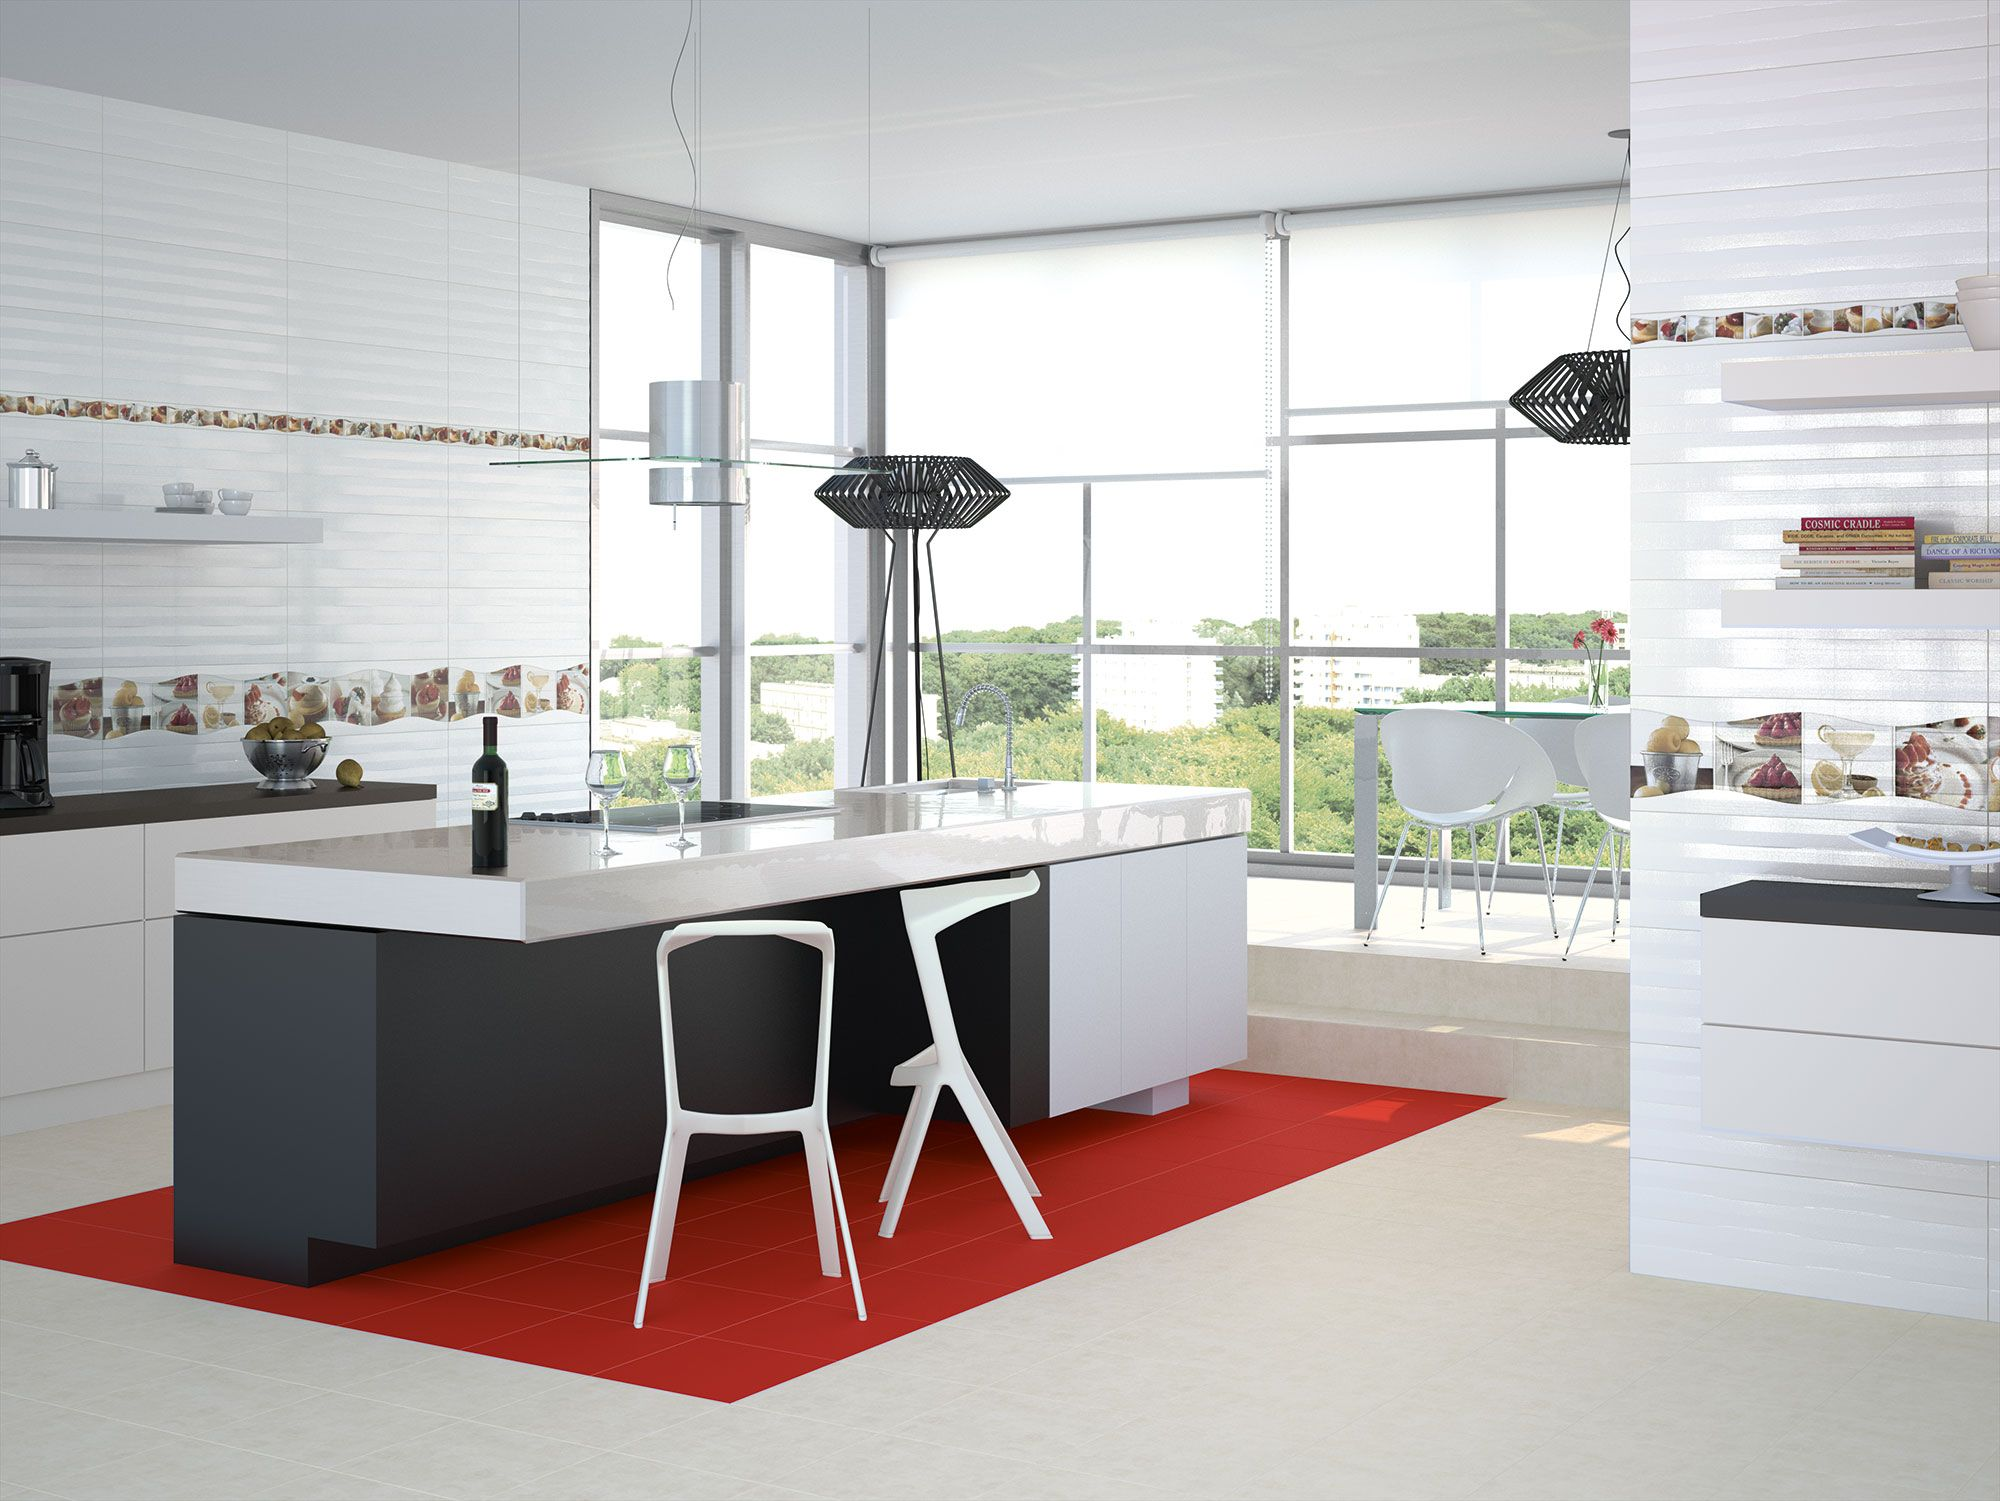 Cocina moderna azulejos fotos azulejos para cocinas - Azulejos de cocina modernos ...